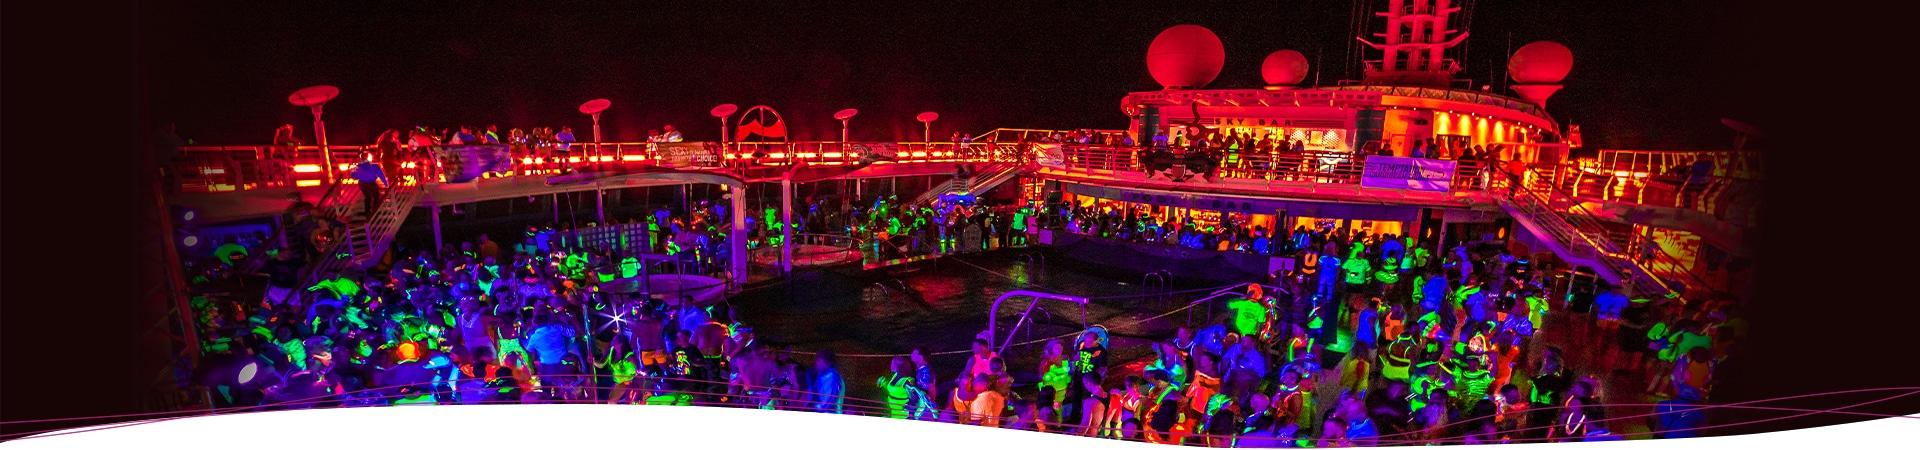 Temptation Caribbean Cruise 2021 | Temptation Experience